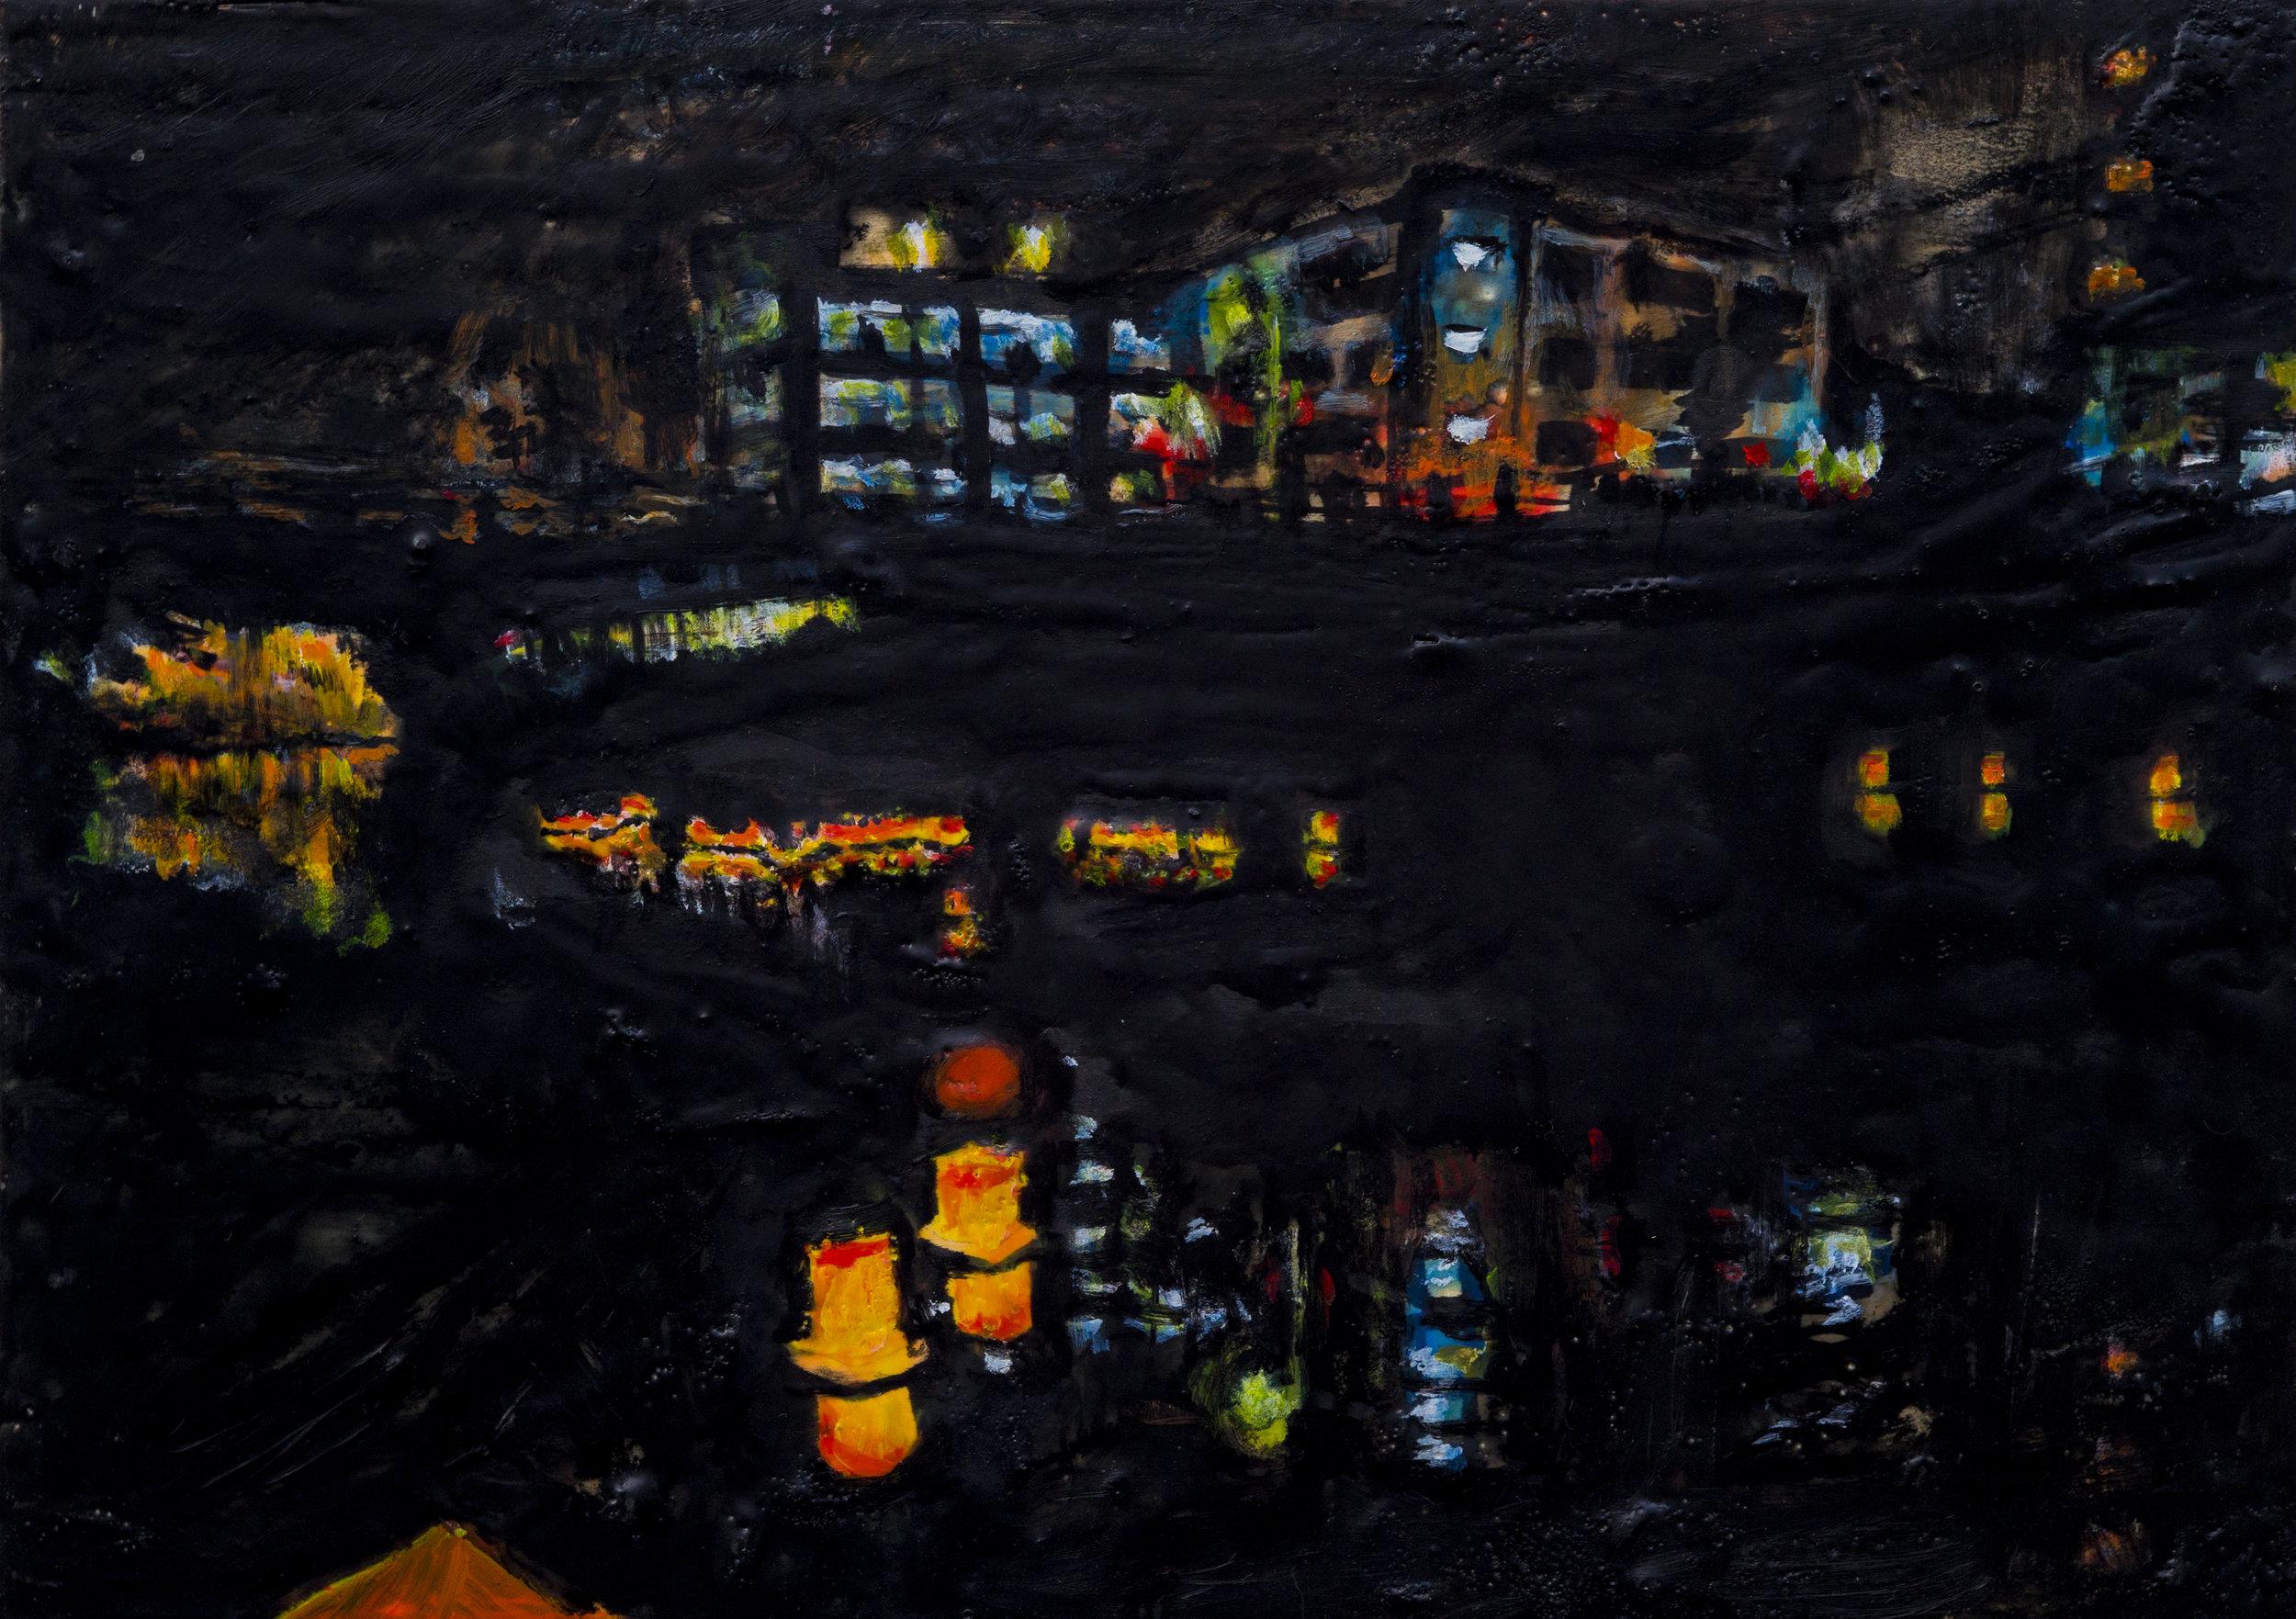 Dark Night of the Soul: Farewell